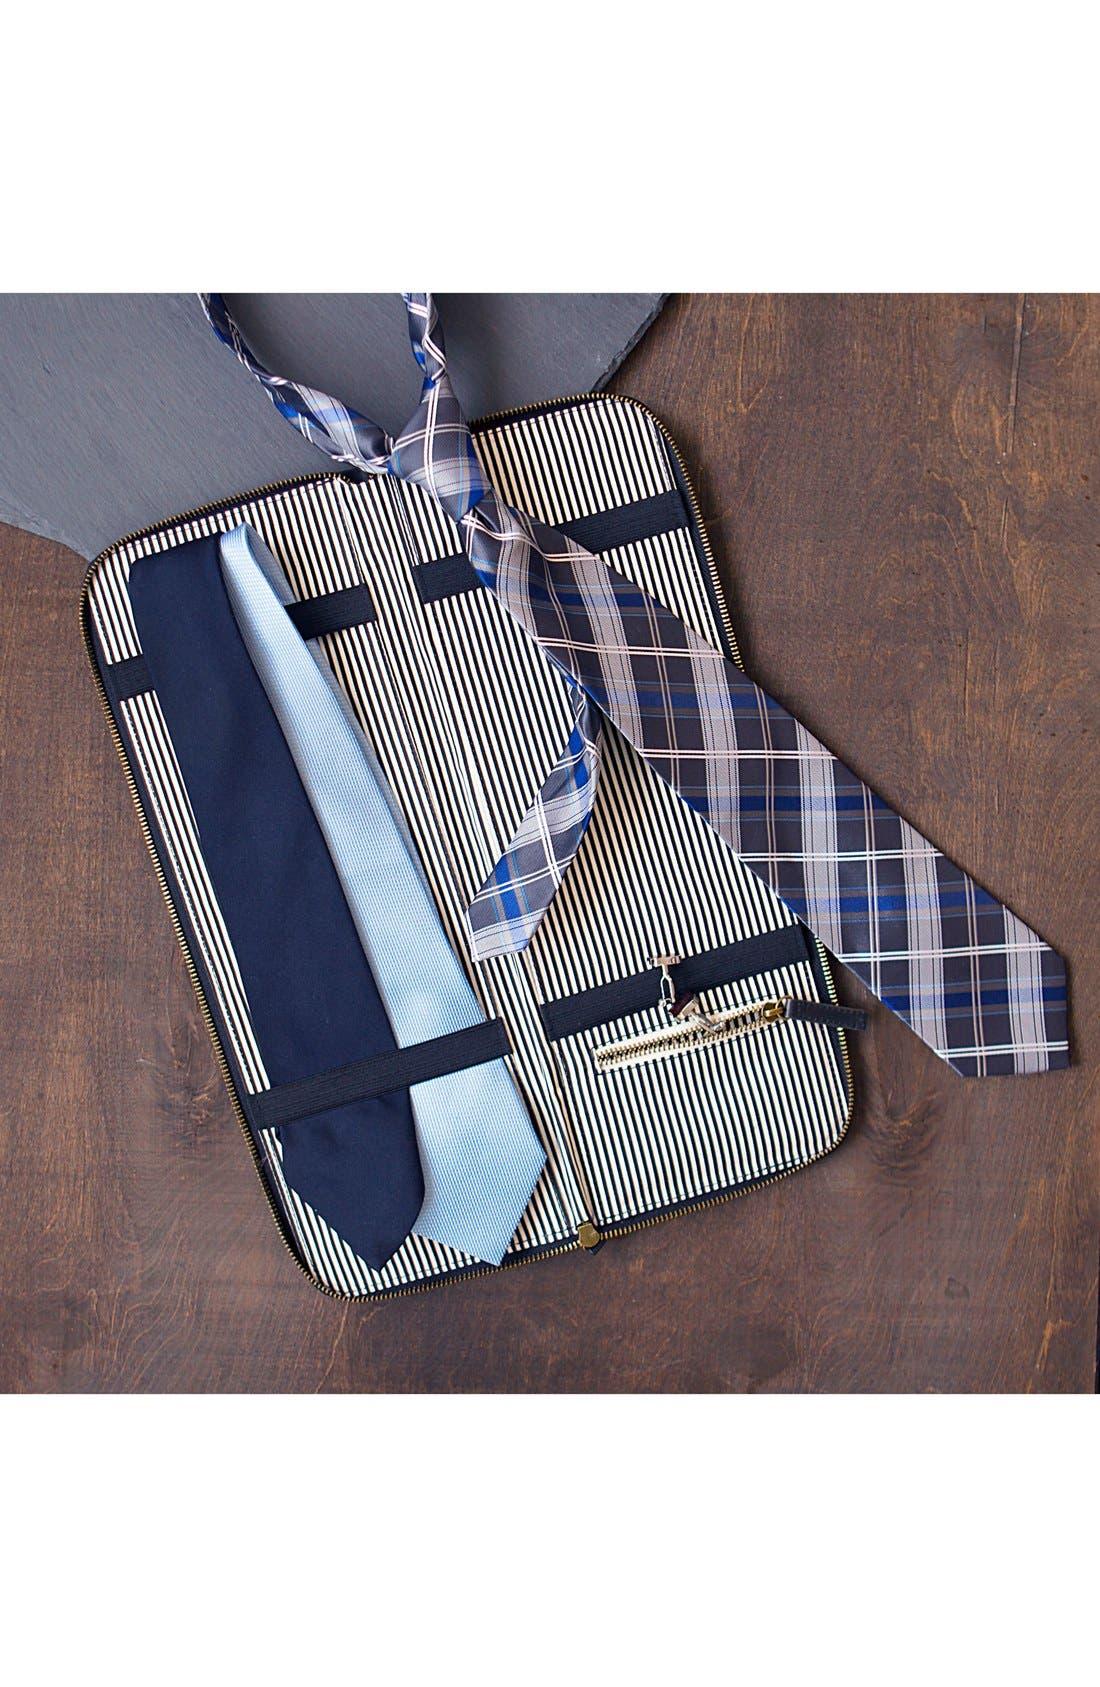 Monogram Tie Case,                             Alternate thumbnail 2, color,                             NAVY